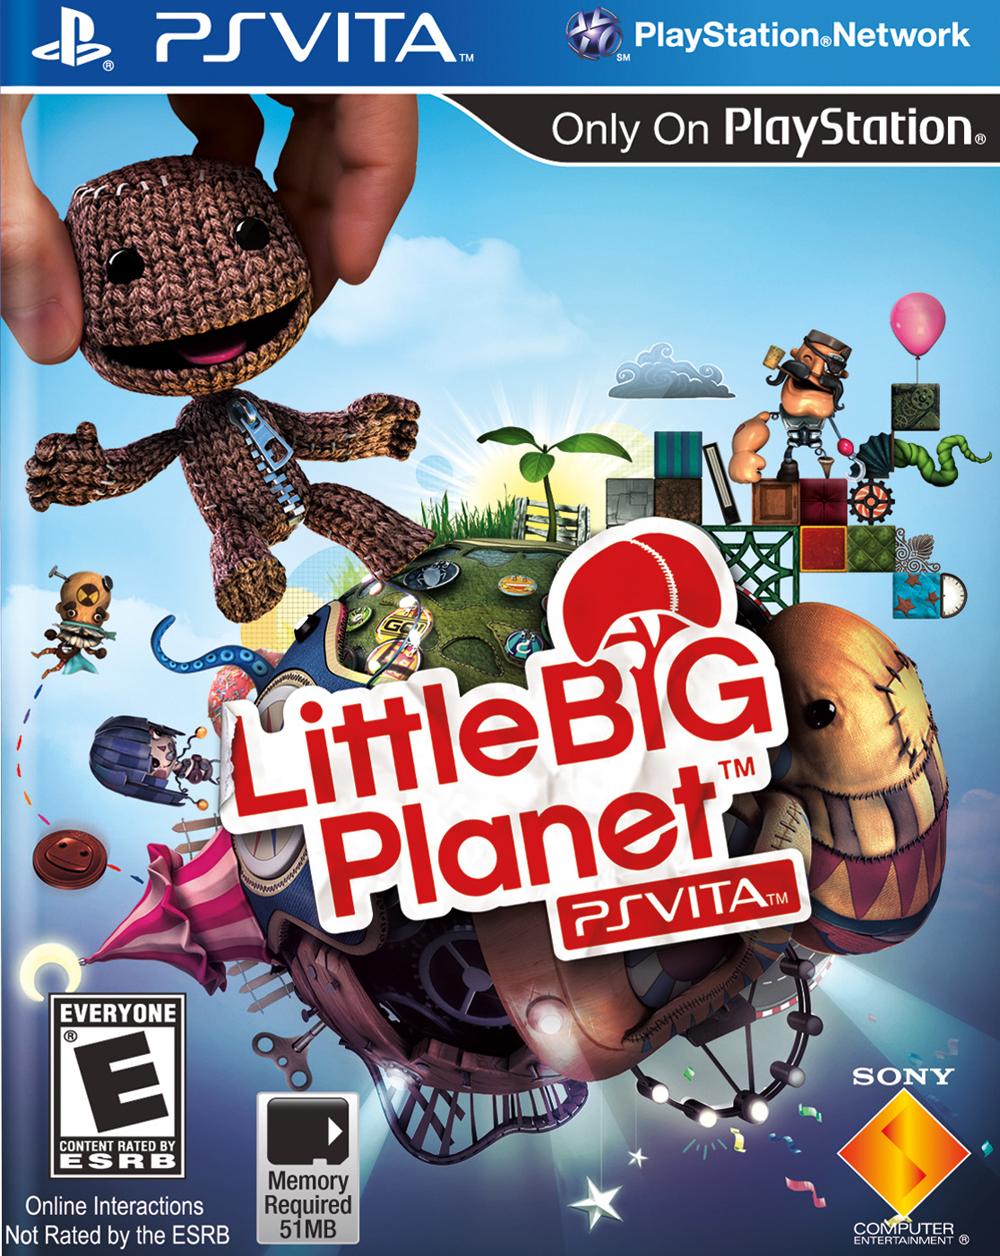 LittleBigPlanet [Vita]